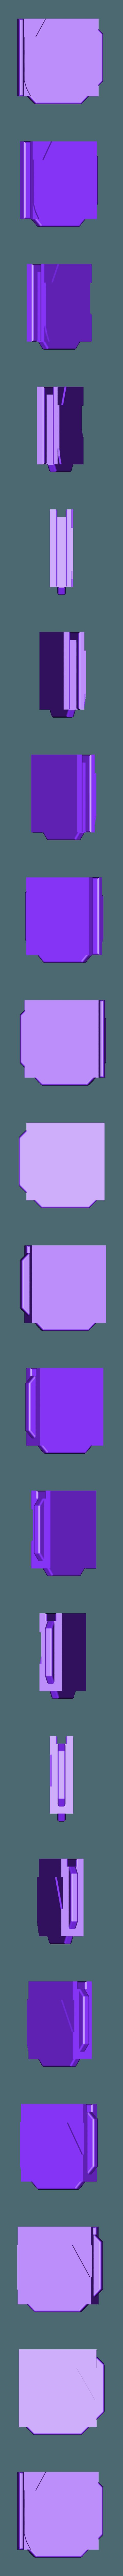 Piece - Part 4.stl Download free STL file Taquin CULTS / Sliding Puzzle • 3D print model, Valelab3D